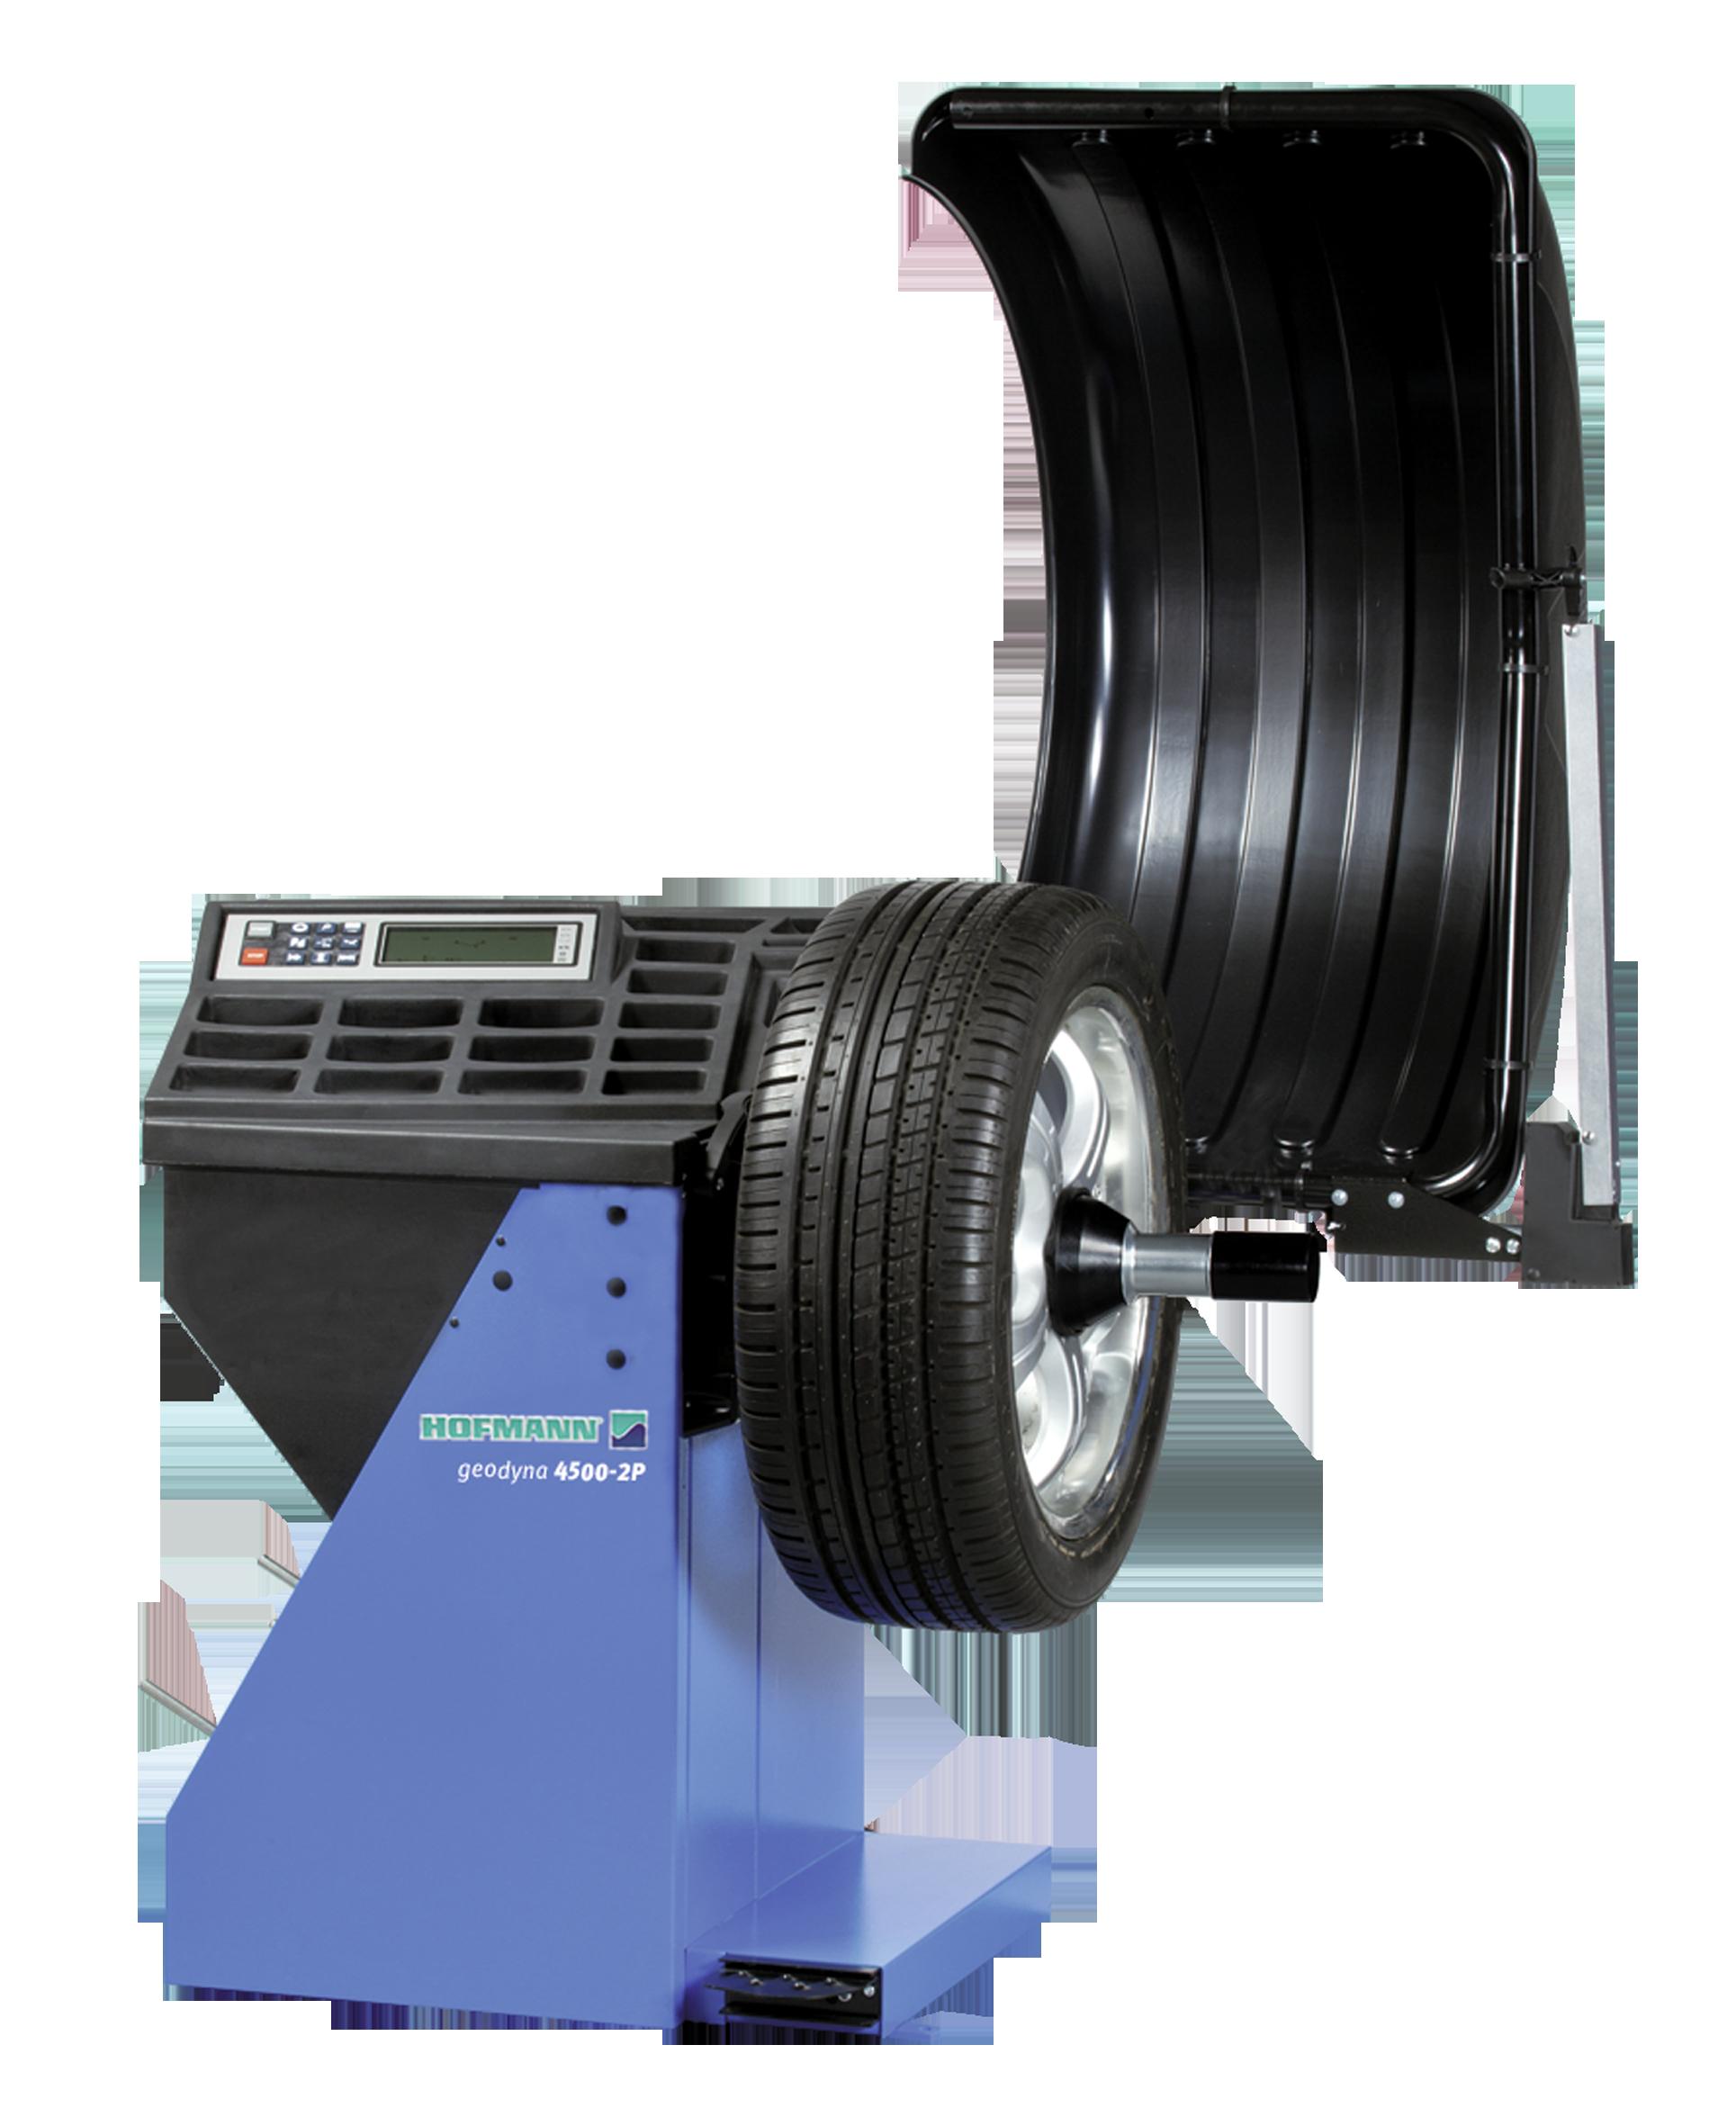 geodyna 4500 2p car wheel balancer with lc display hofmann rh eu hofmann equipment com